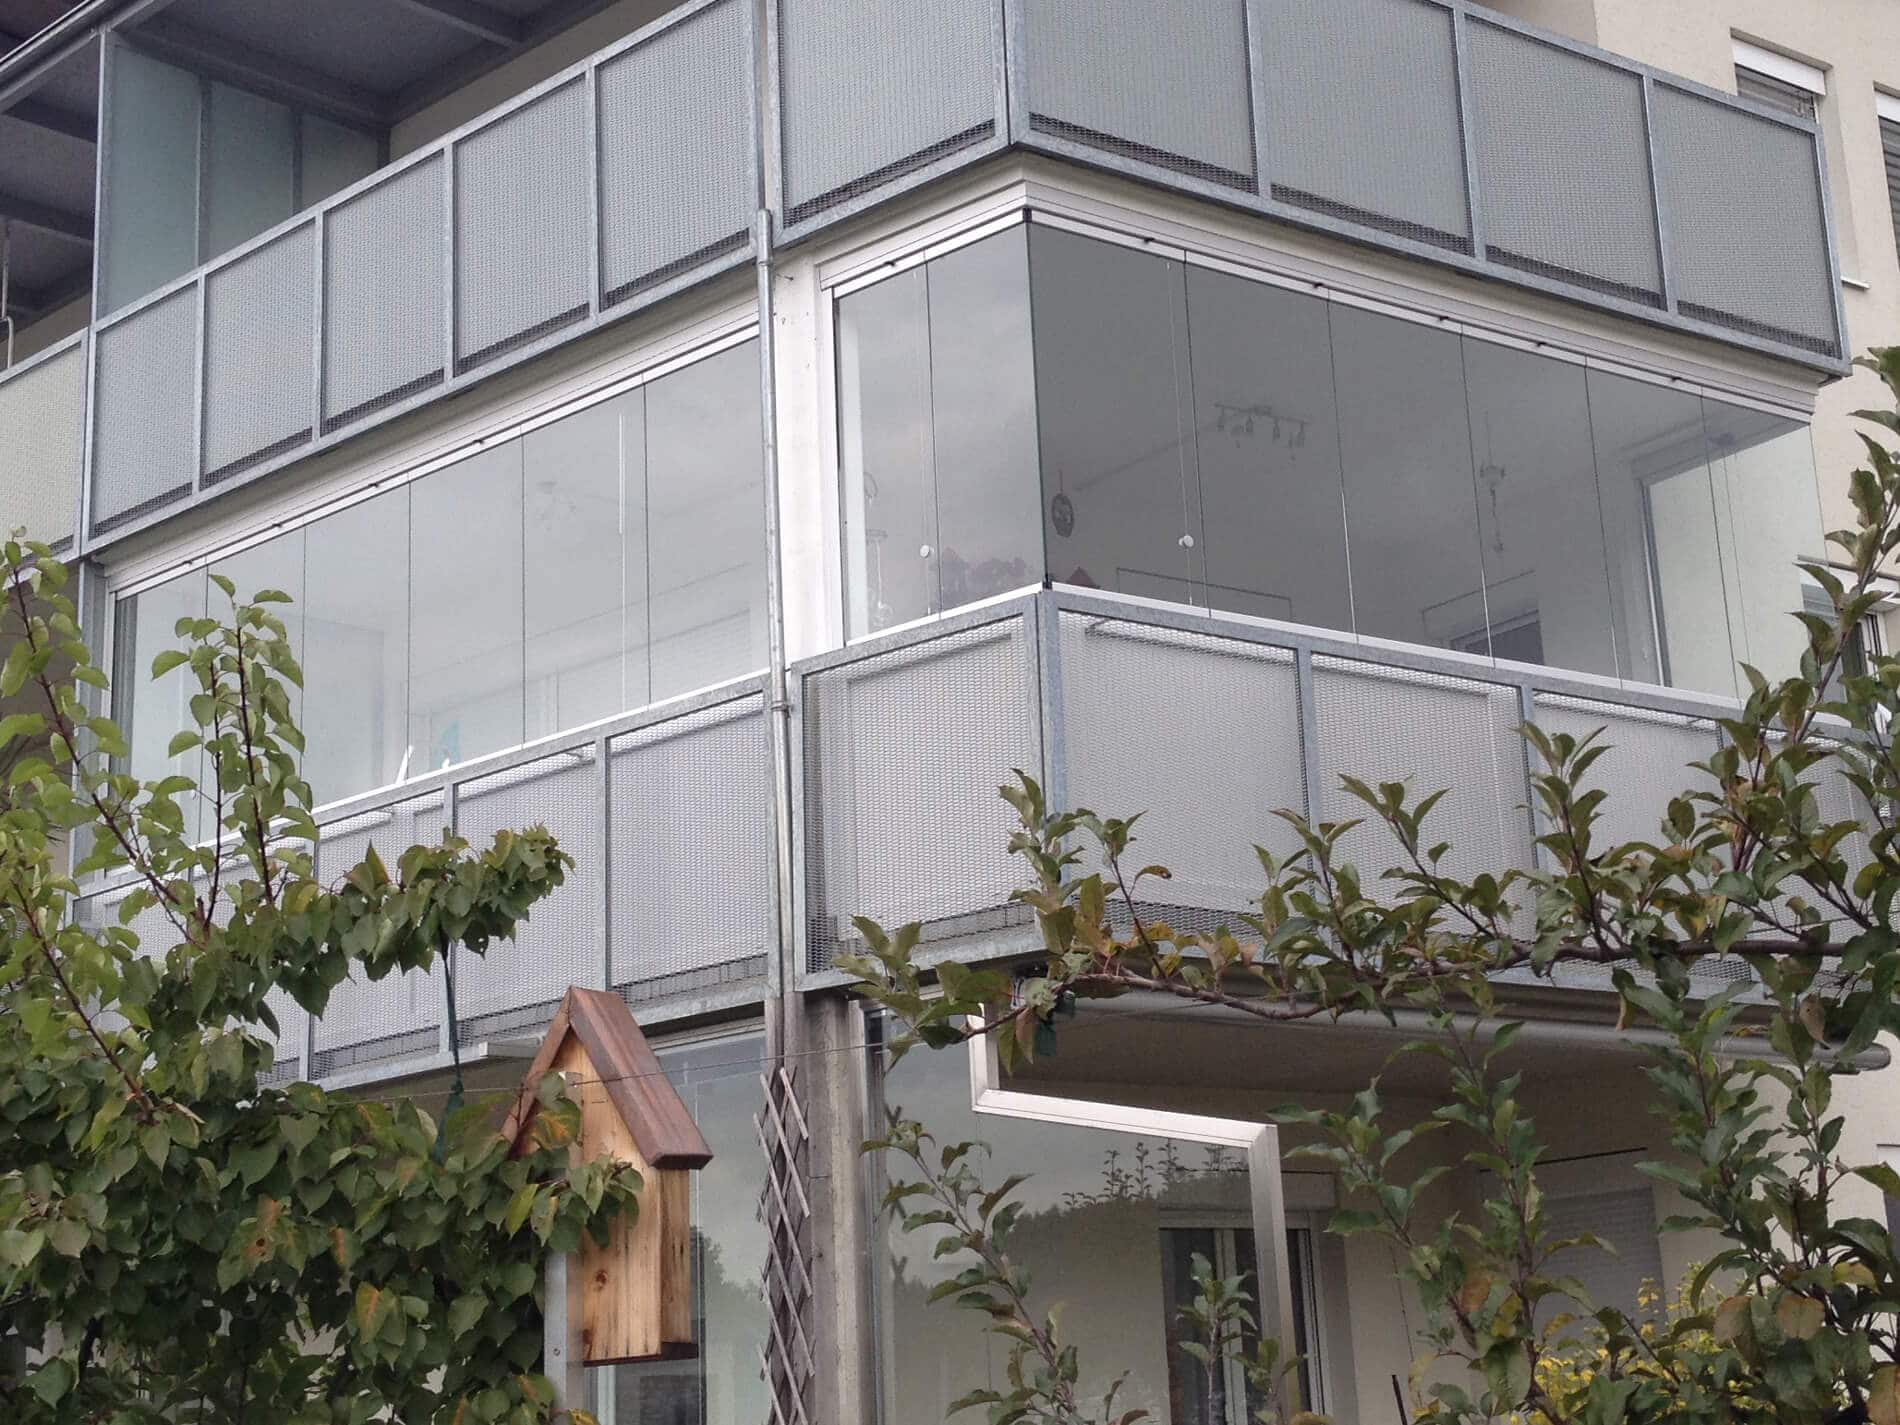 Schiebe Falt Fenster - Balkonverglasung